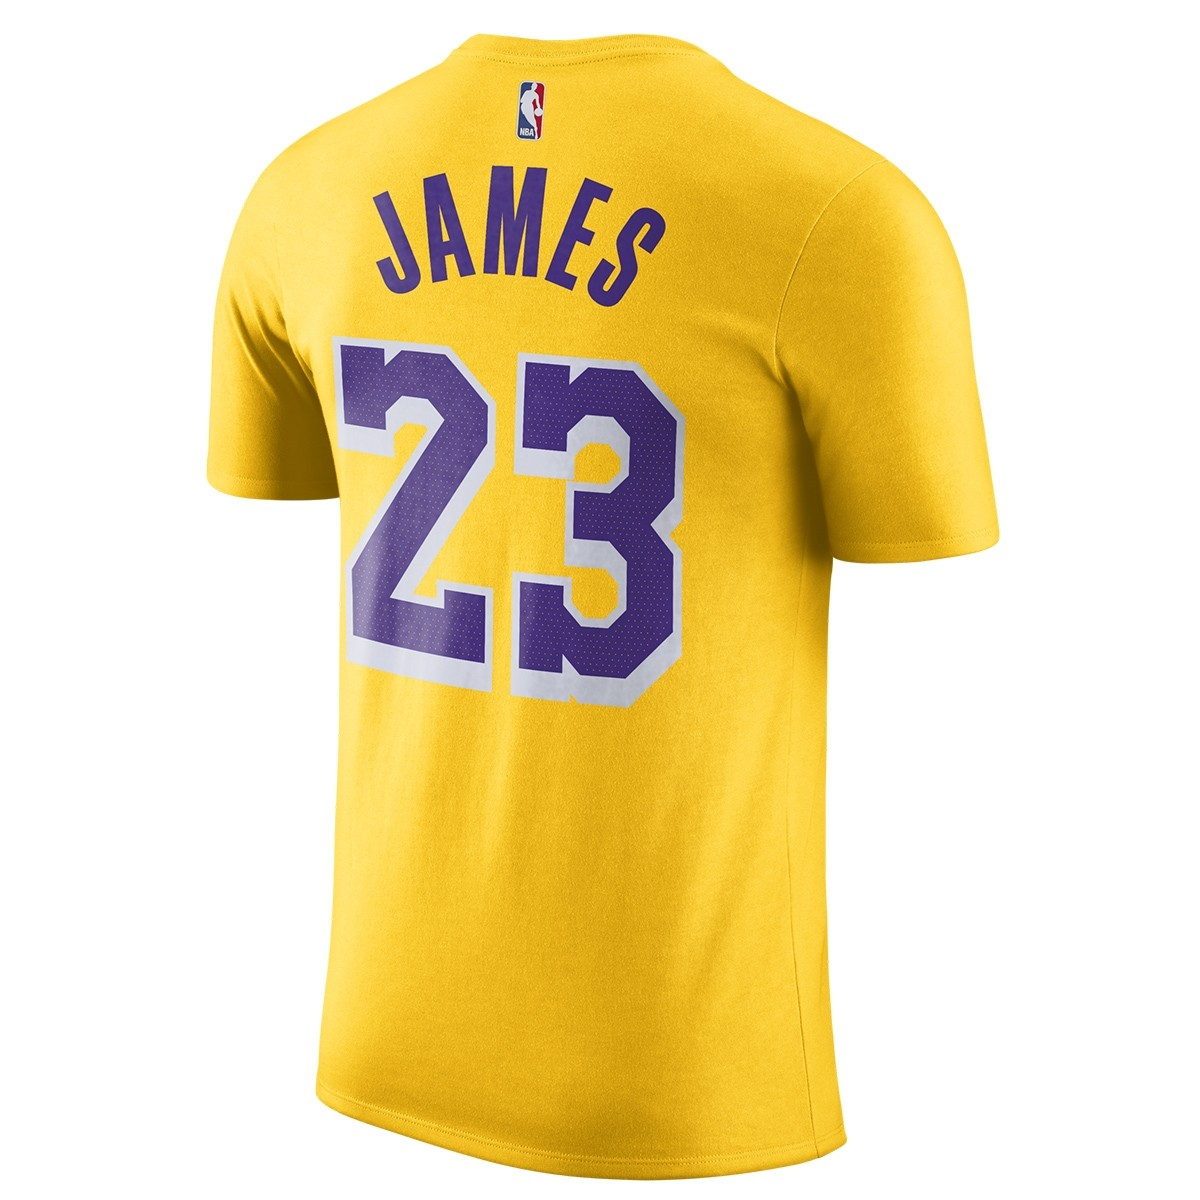 Nike Dri-Fit T-Shirt Lakers 'James'-BQ1540-743